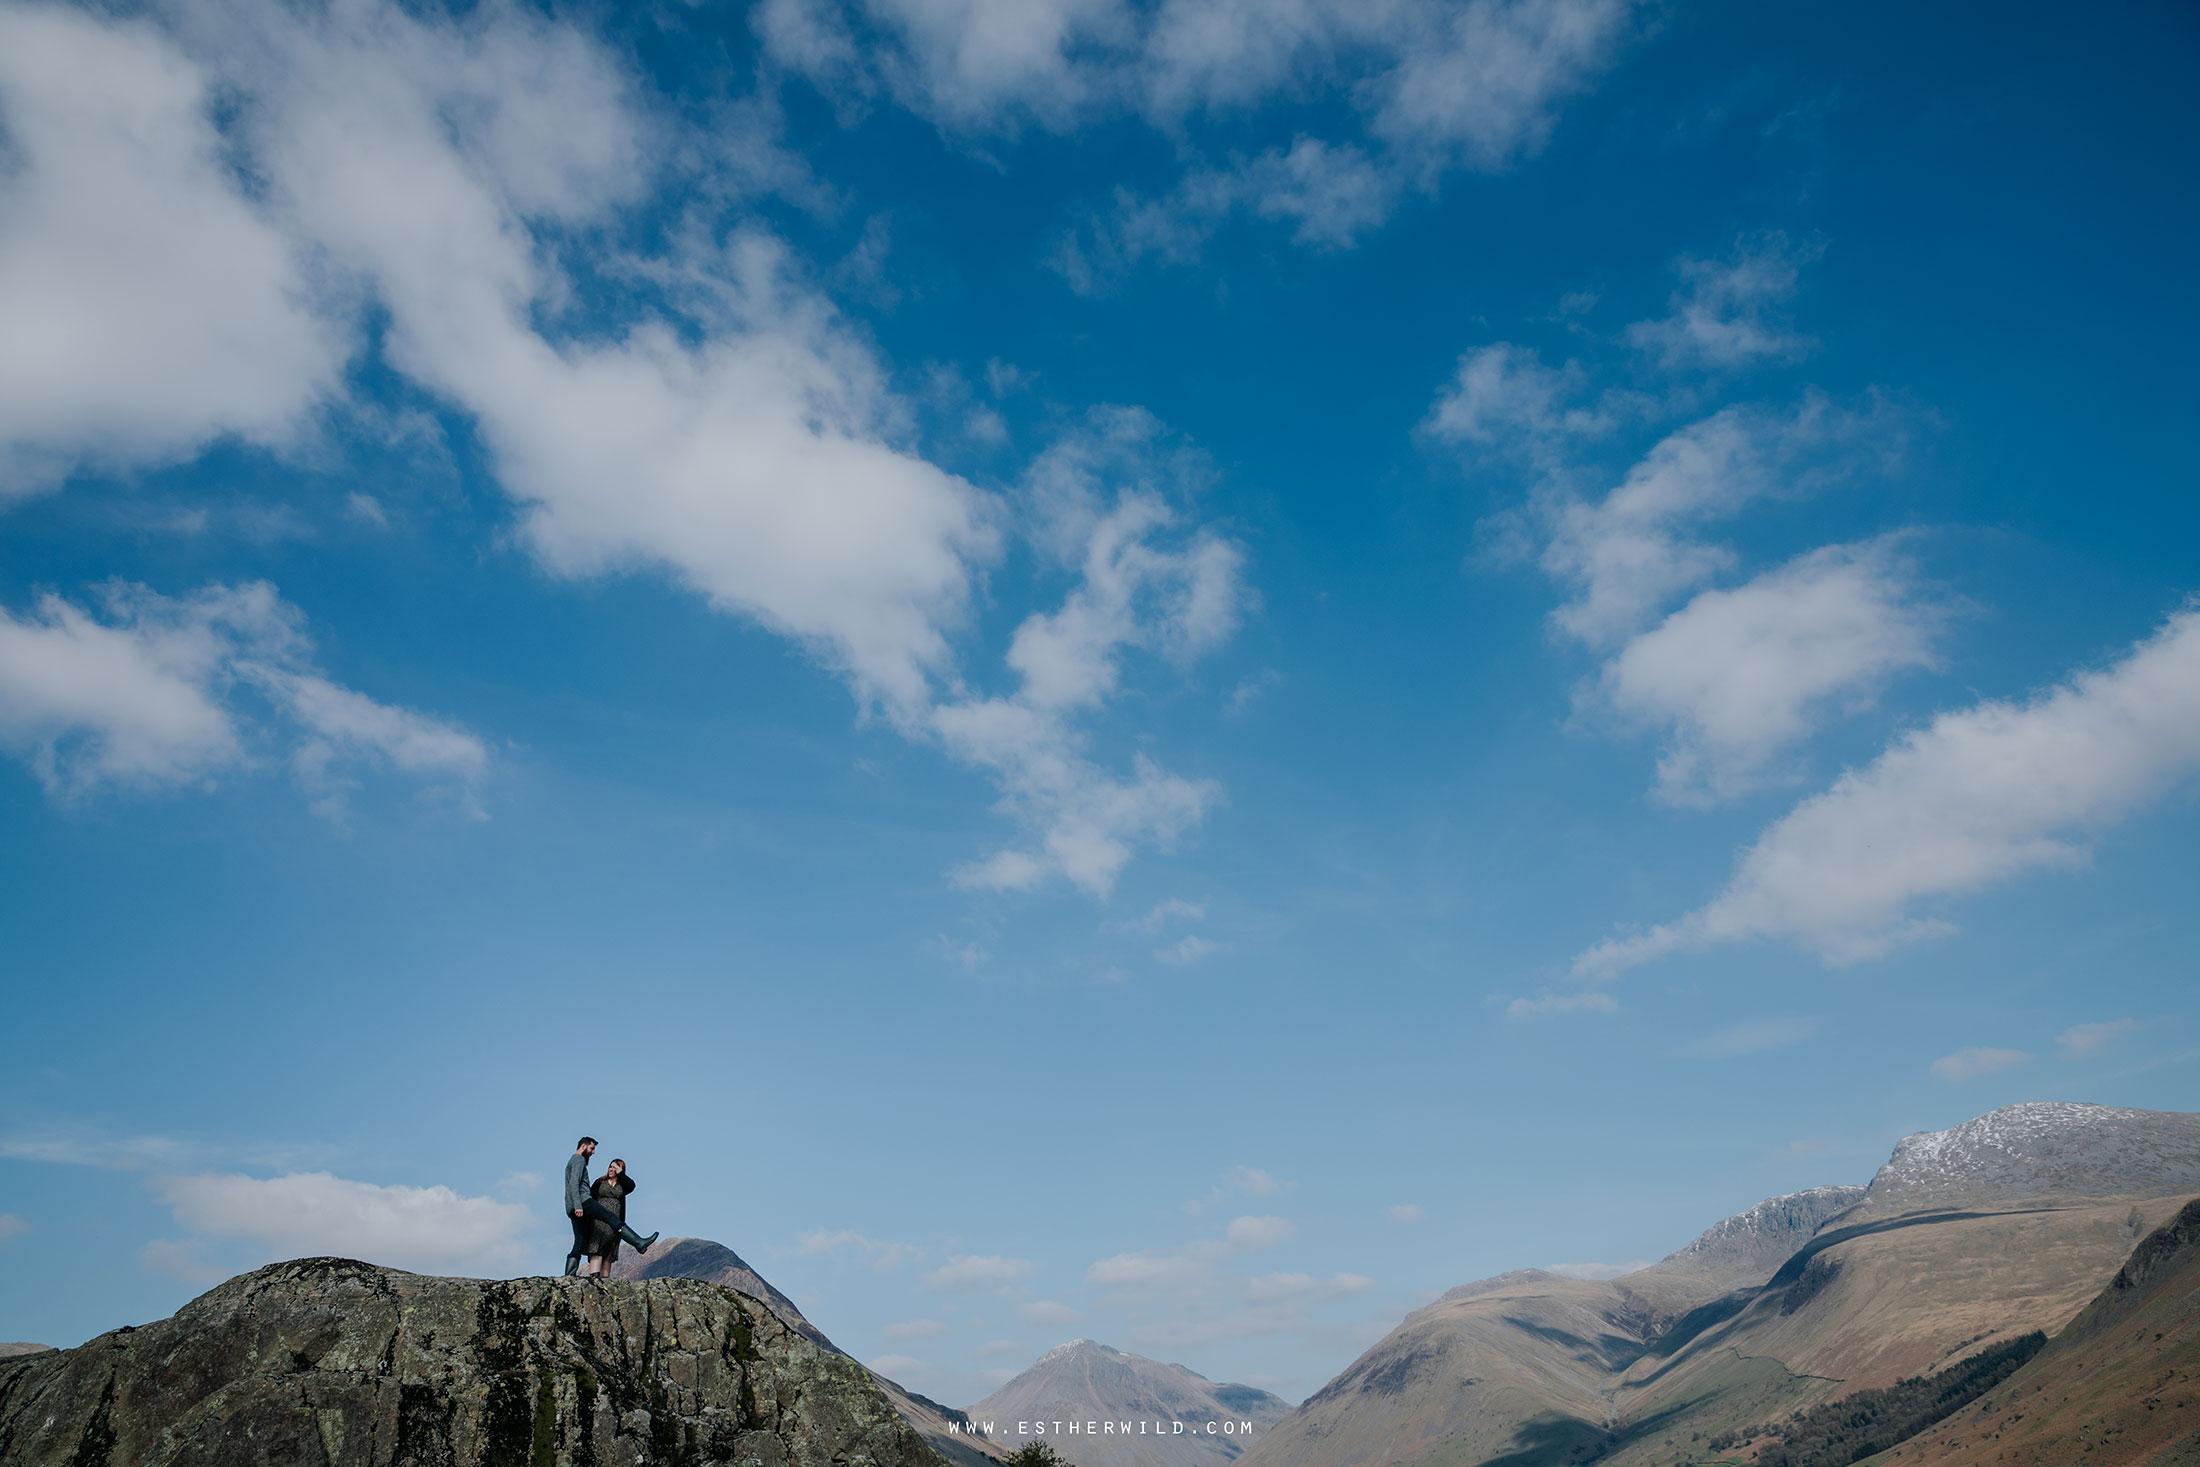 Cumbria_Lake_District_Wasdale_Wedding_Photographer_Destination_Engagement_Anniversary_Esther_Wild_IMG_3203.jpg